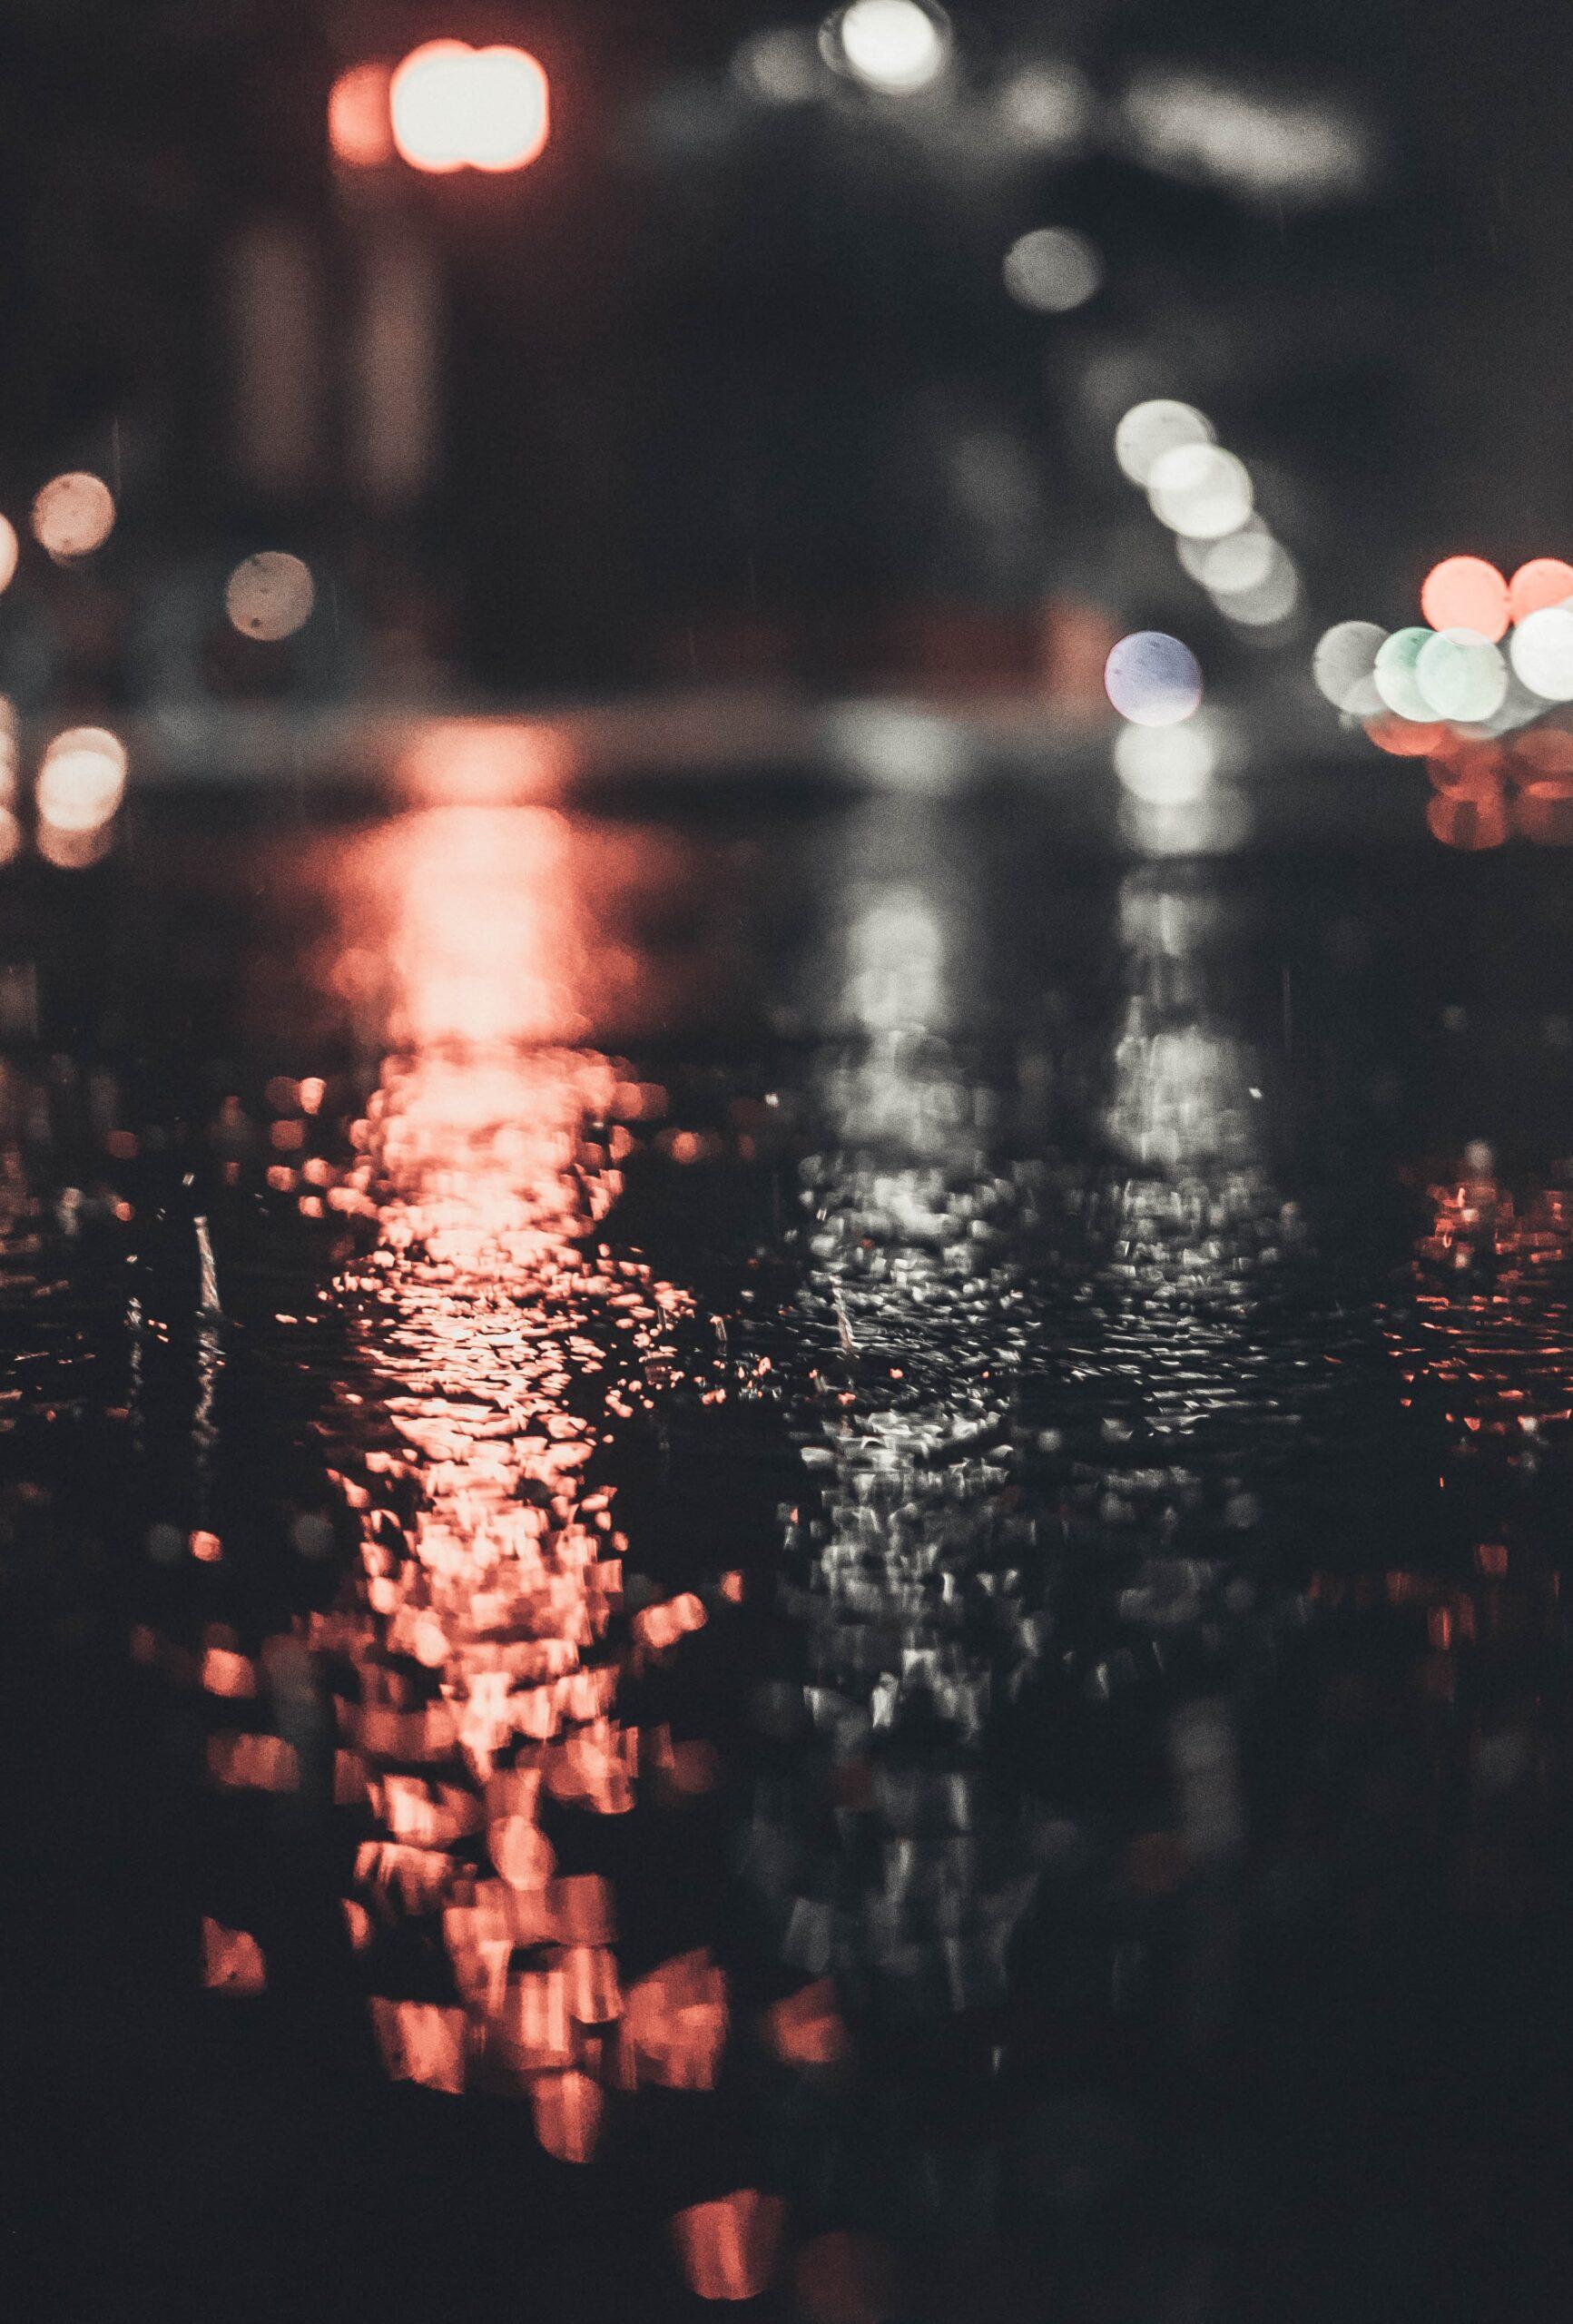 andy-grizzell-rain water splashing on street-unsplash